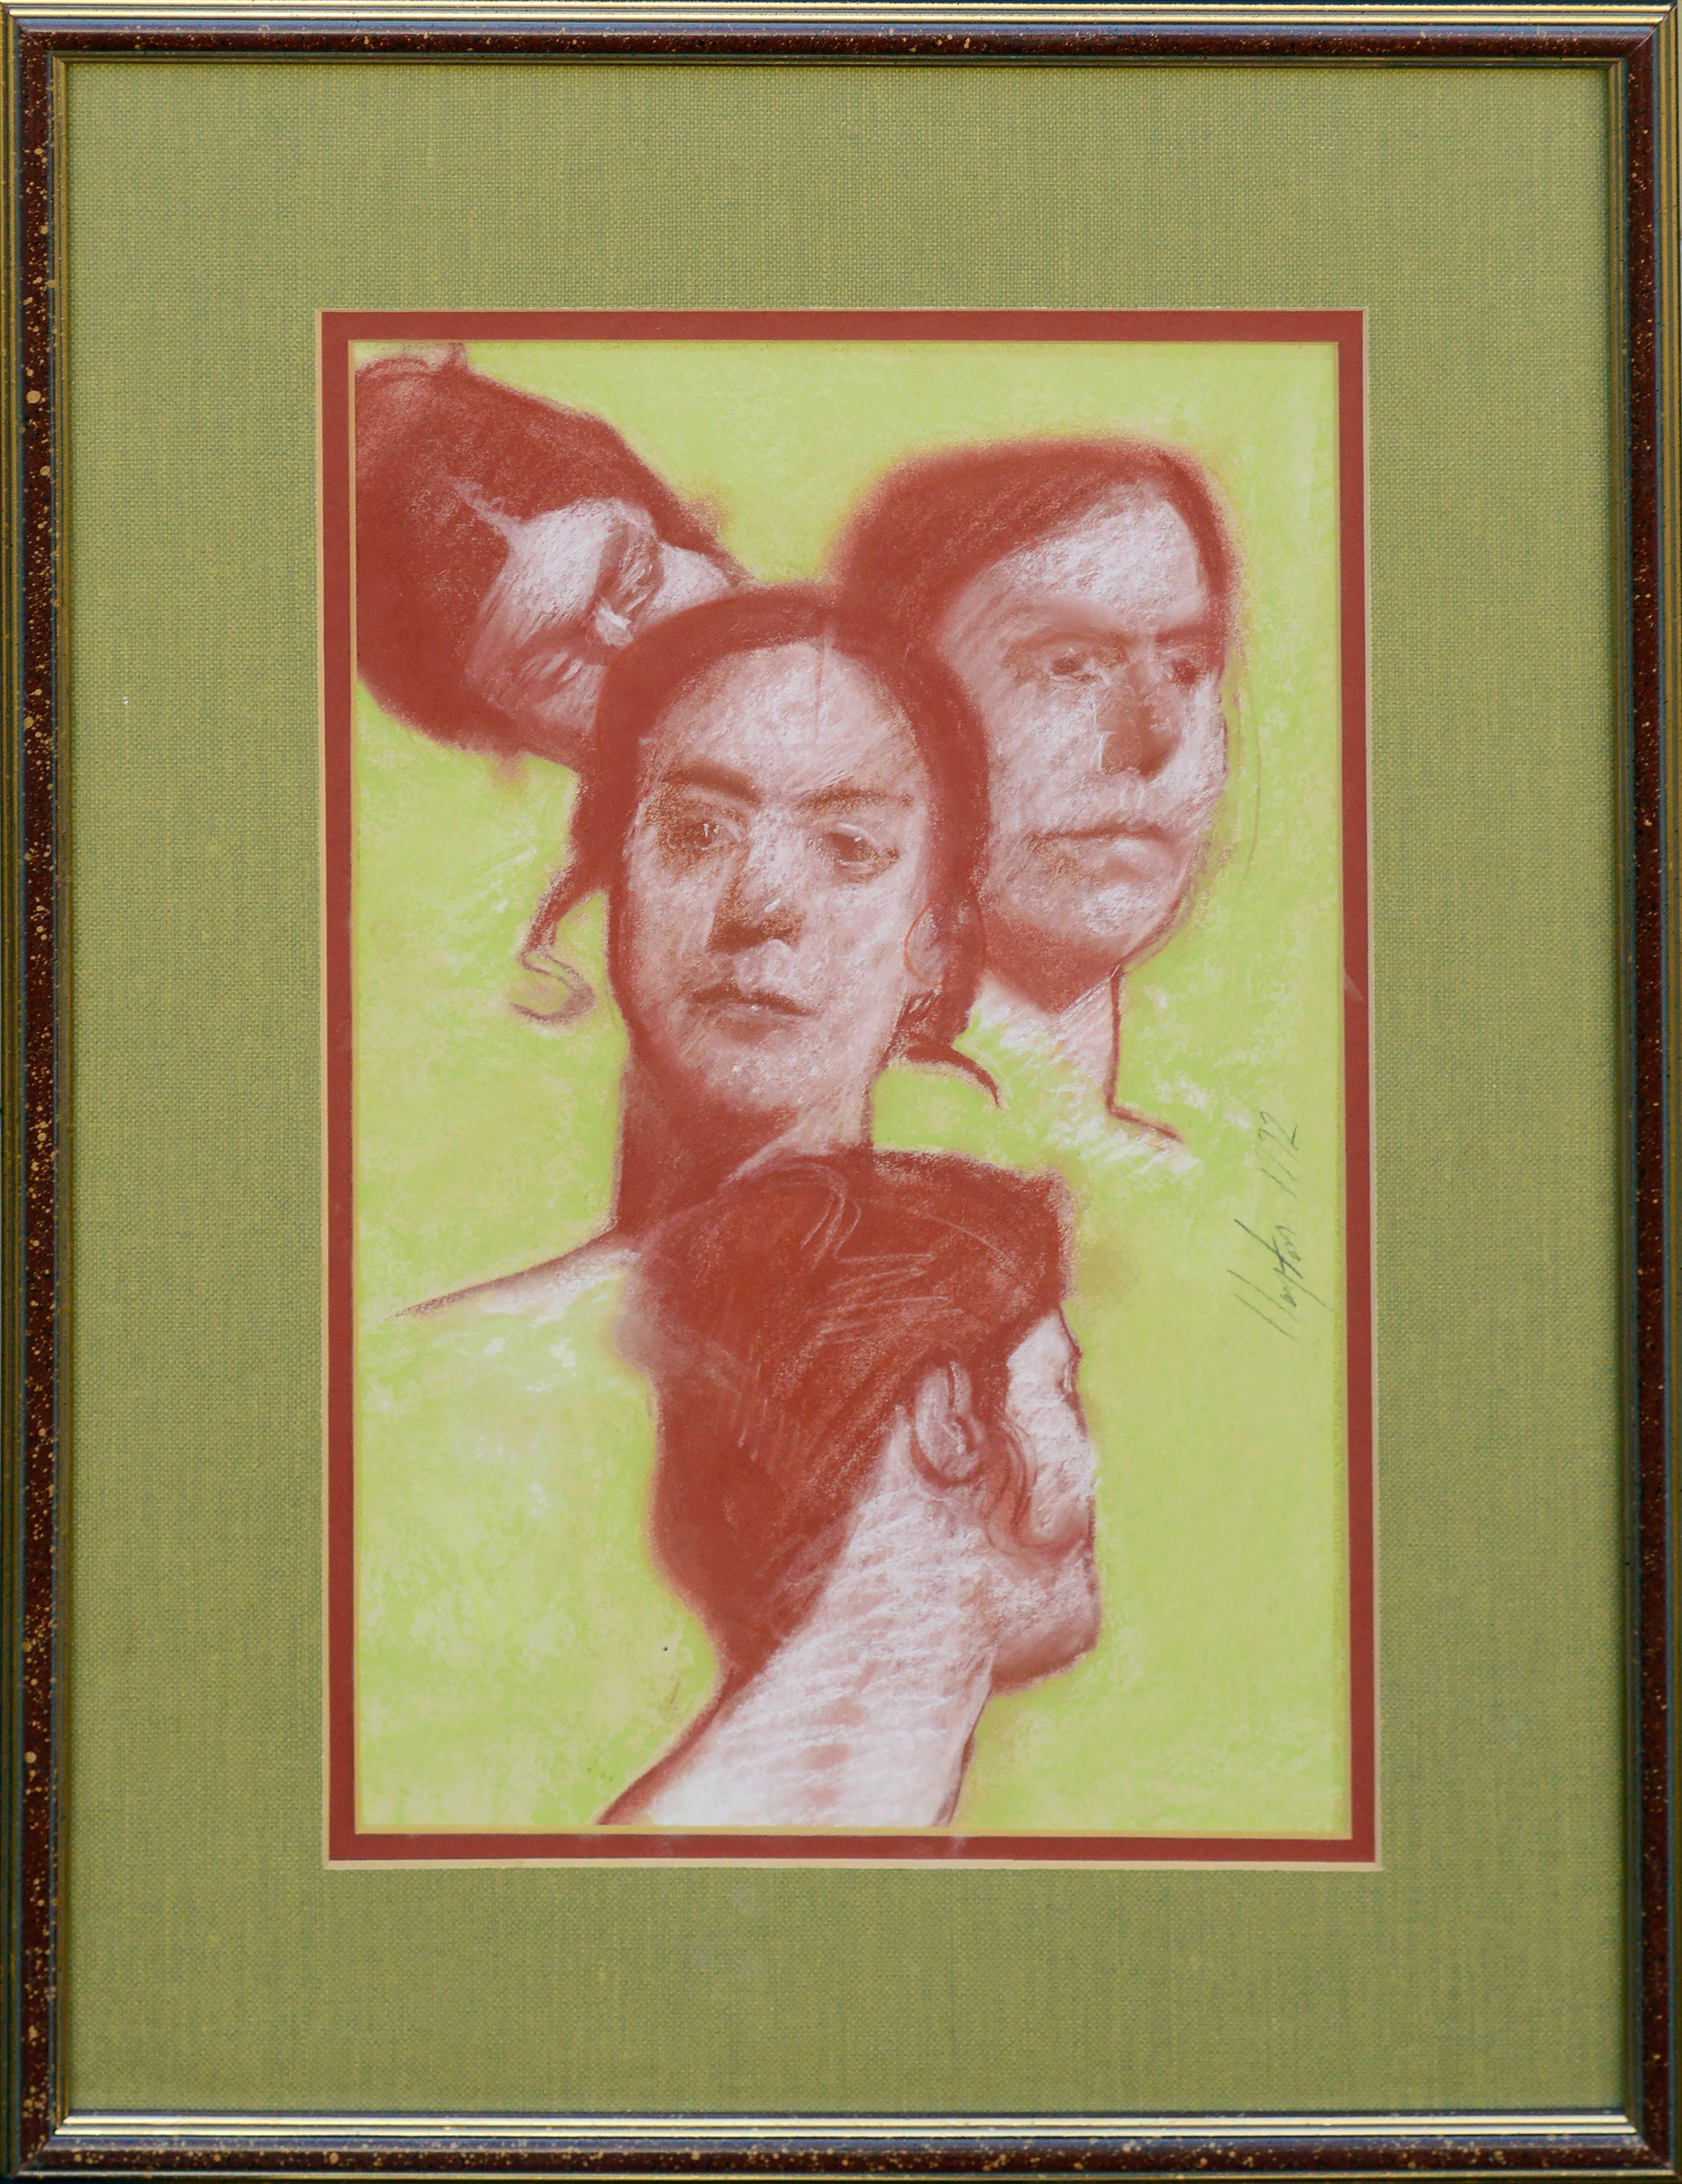 Four Faces - Portrait Study by Clayton Anderson